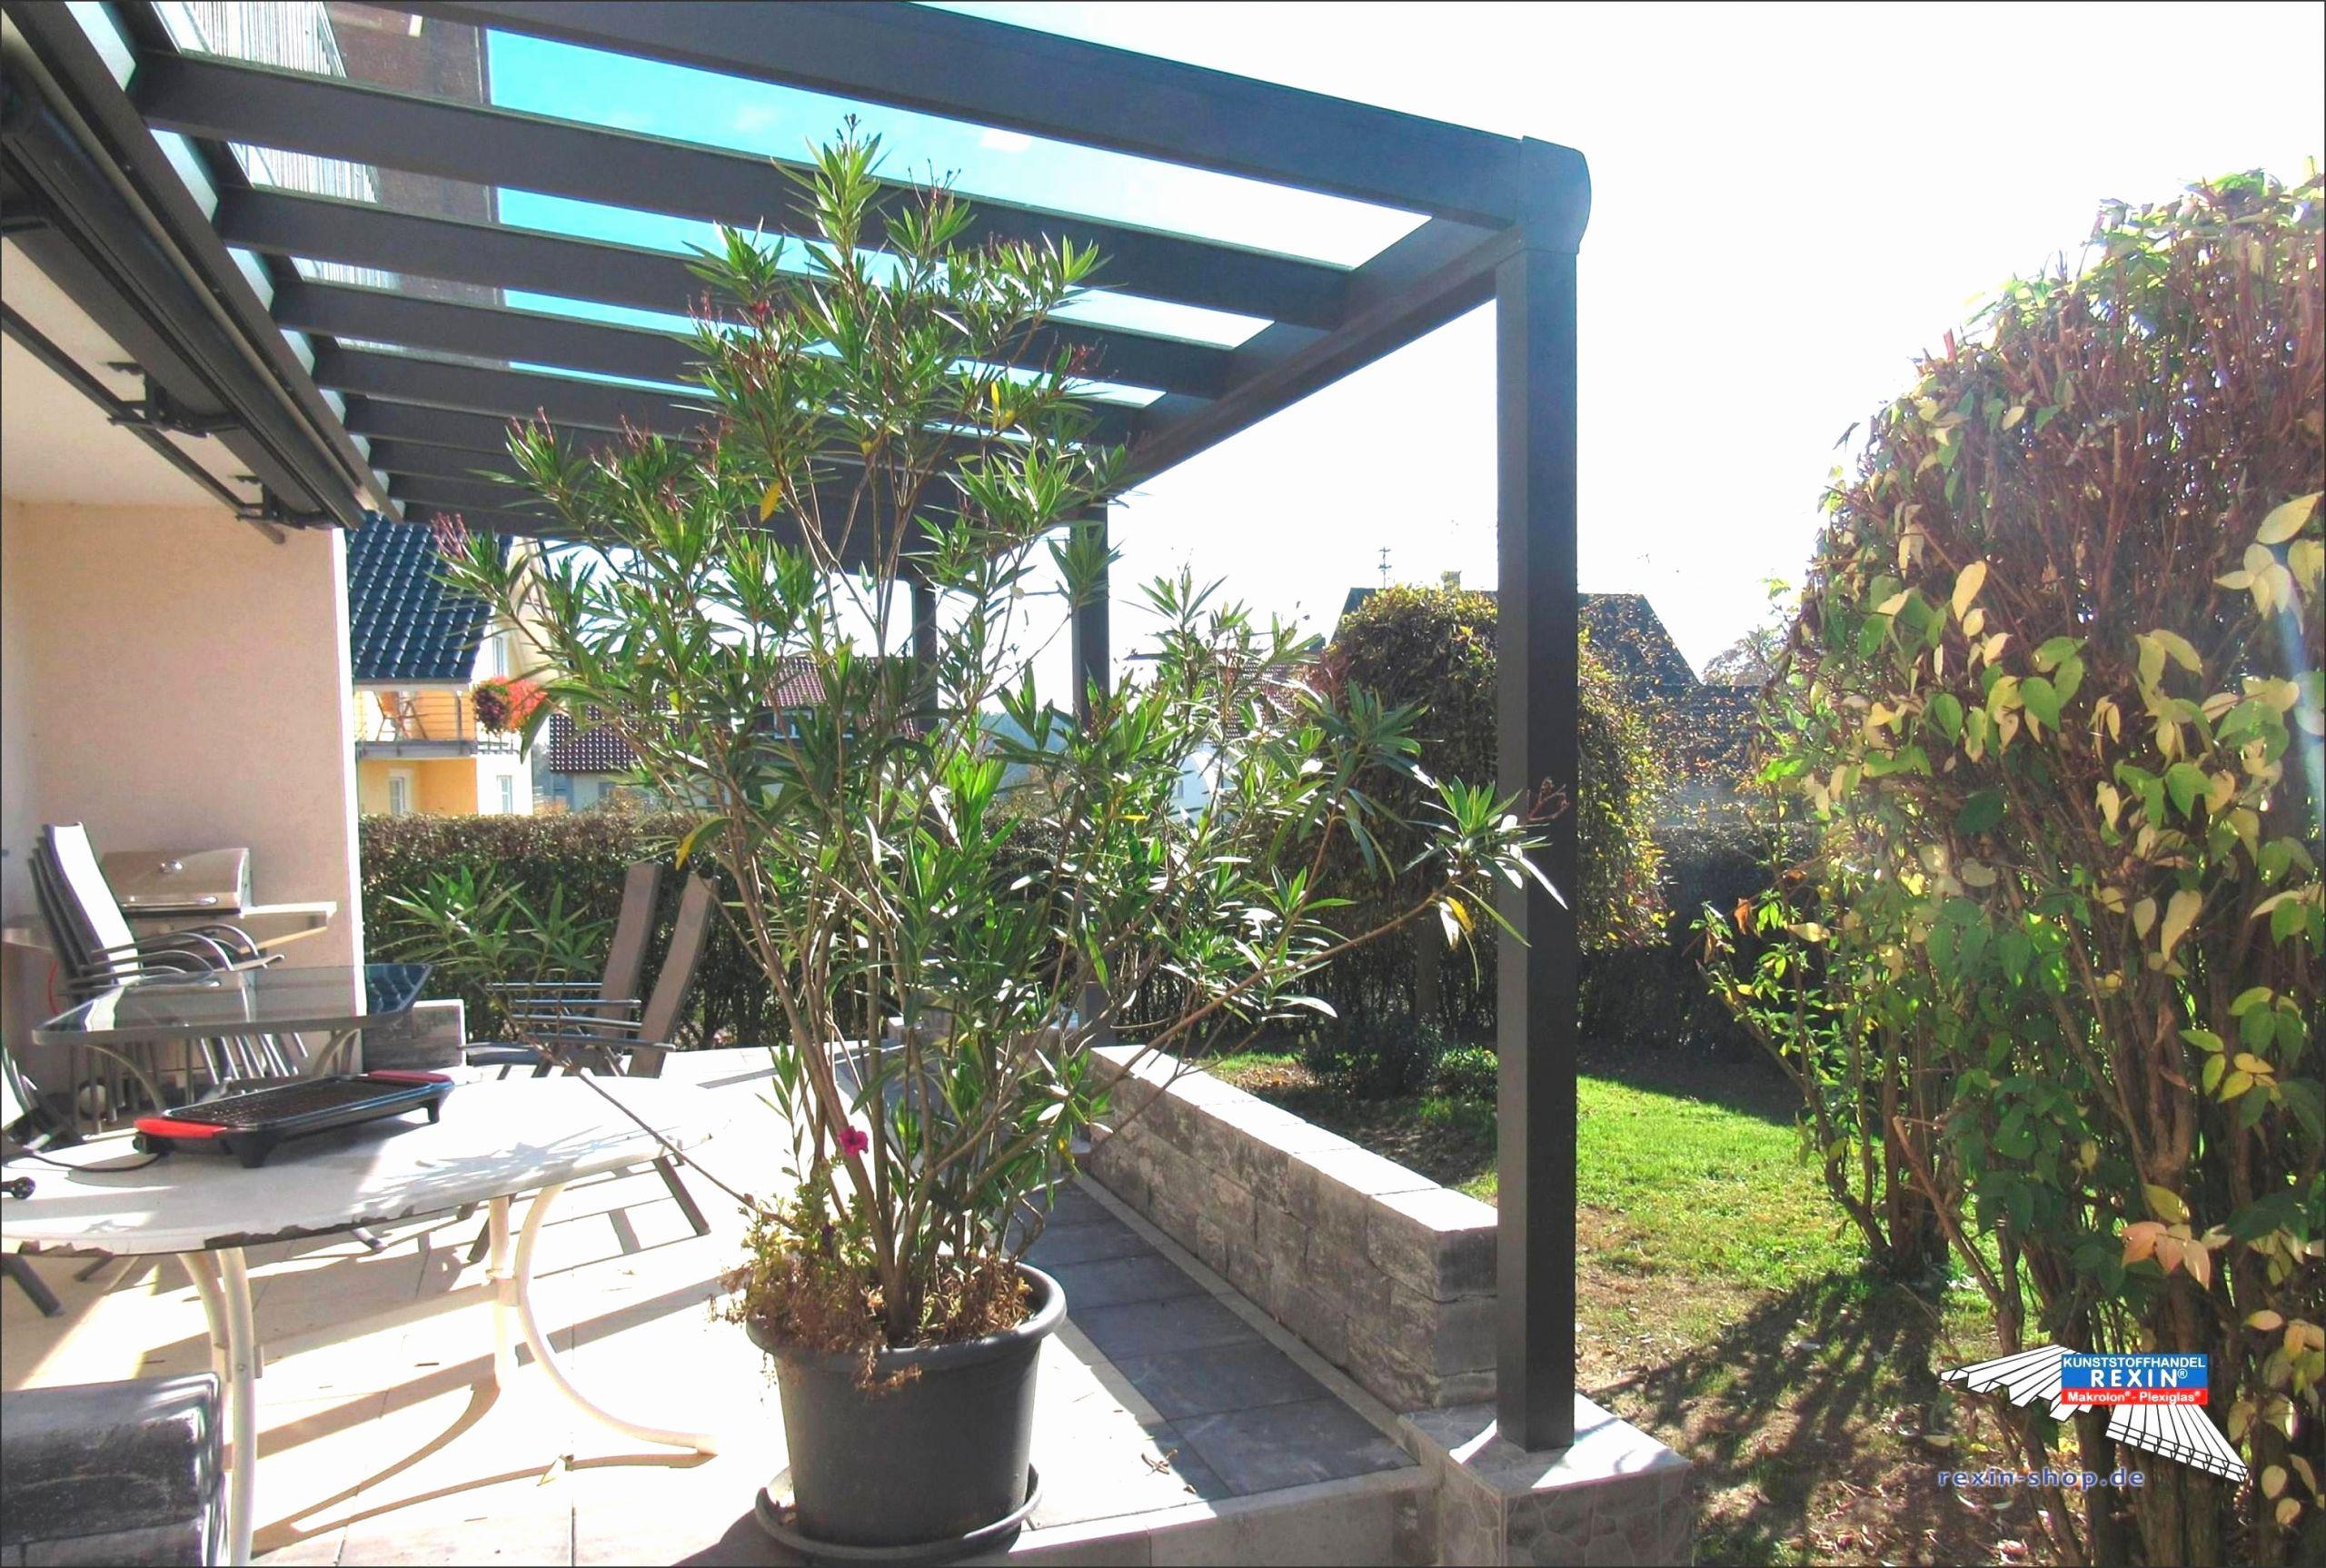 terrasse bauen lassen preis genial kosten garten anlegen lassen frisch terrasse bauen terrasse anlegen of terrasse bauen lassen preis